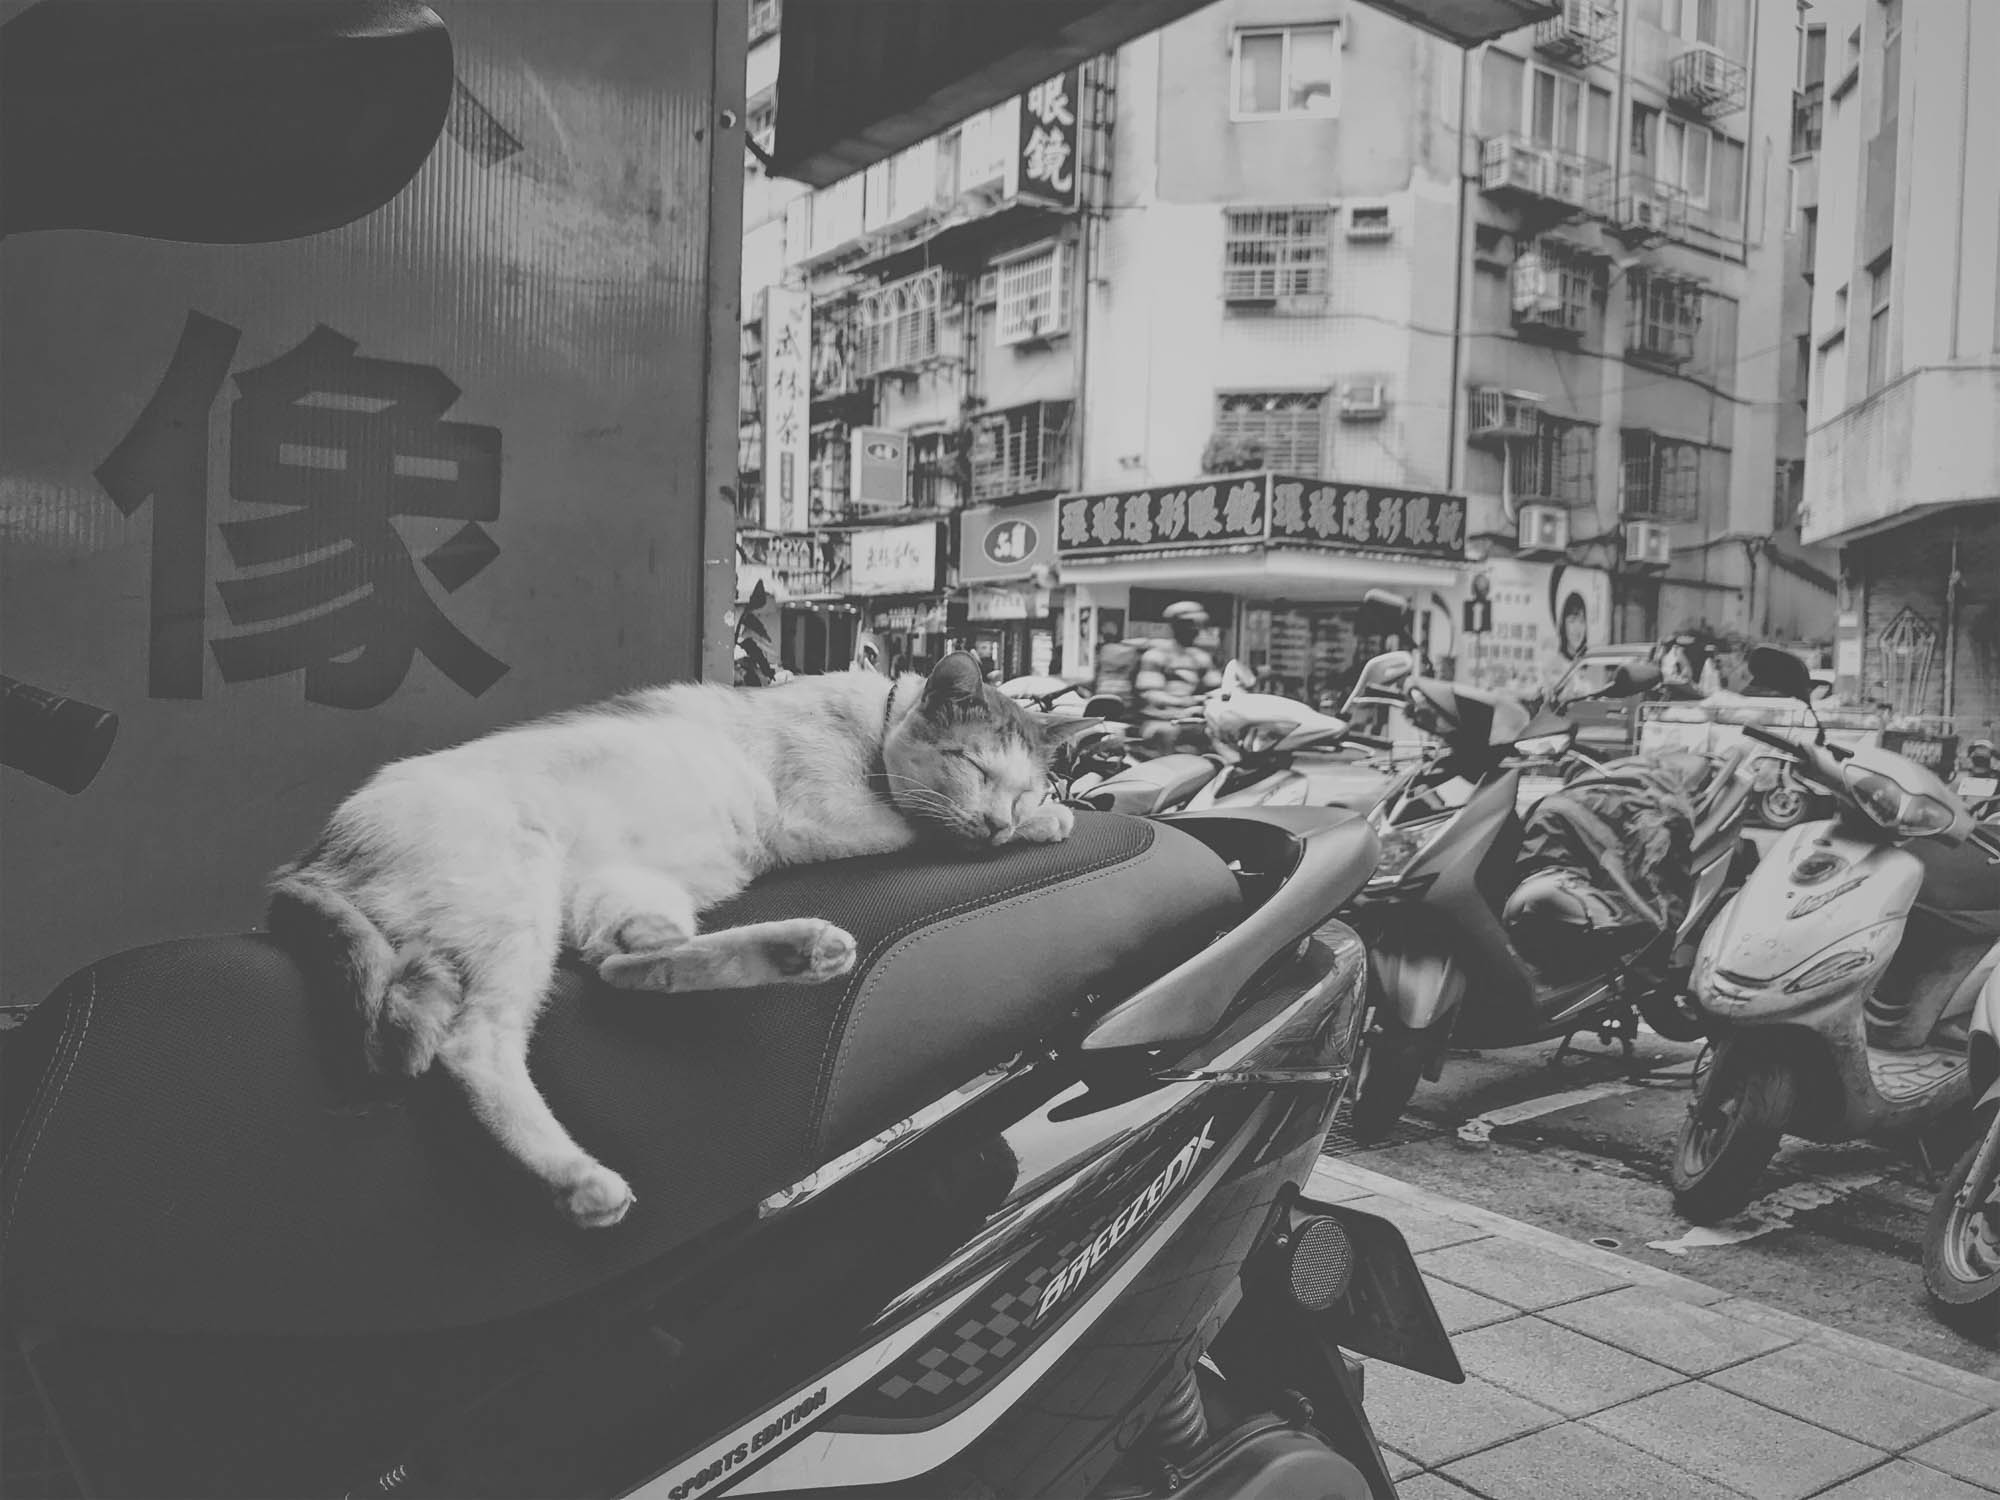 Street cat in Taipei, Taiwan, captured on an iPhone 7